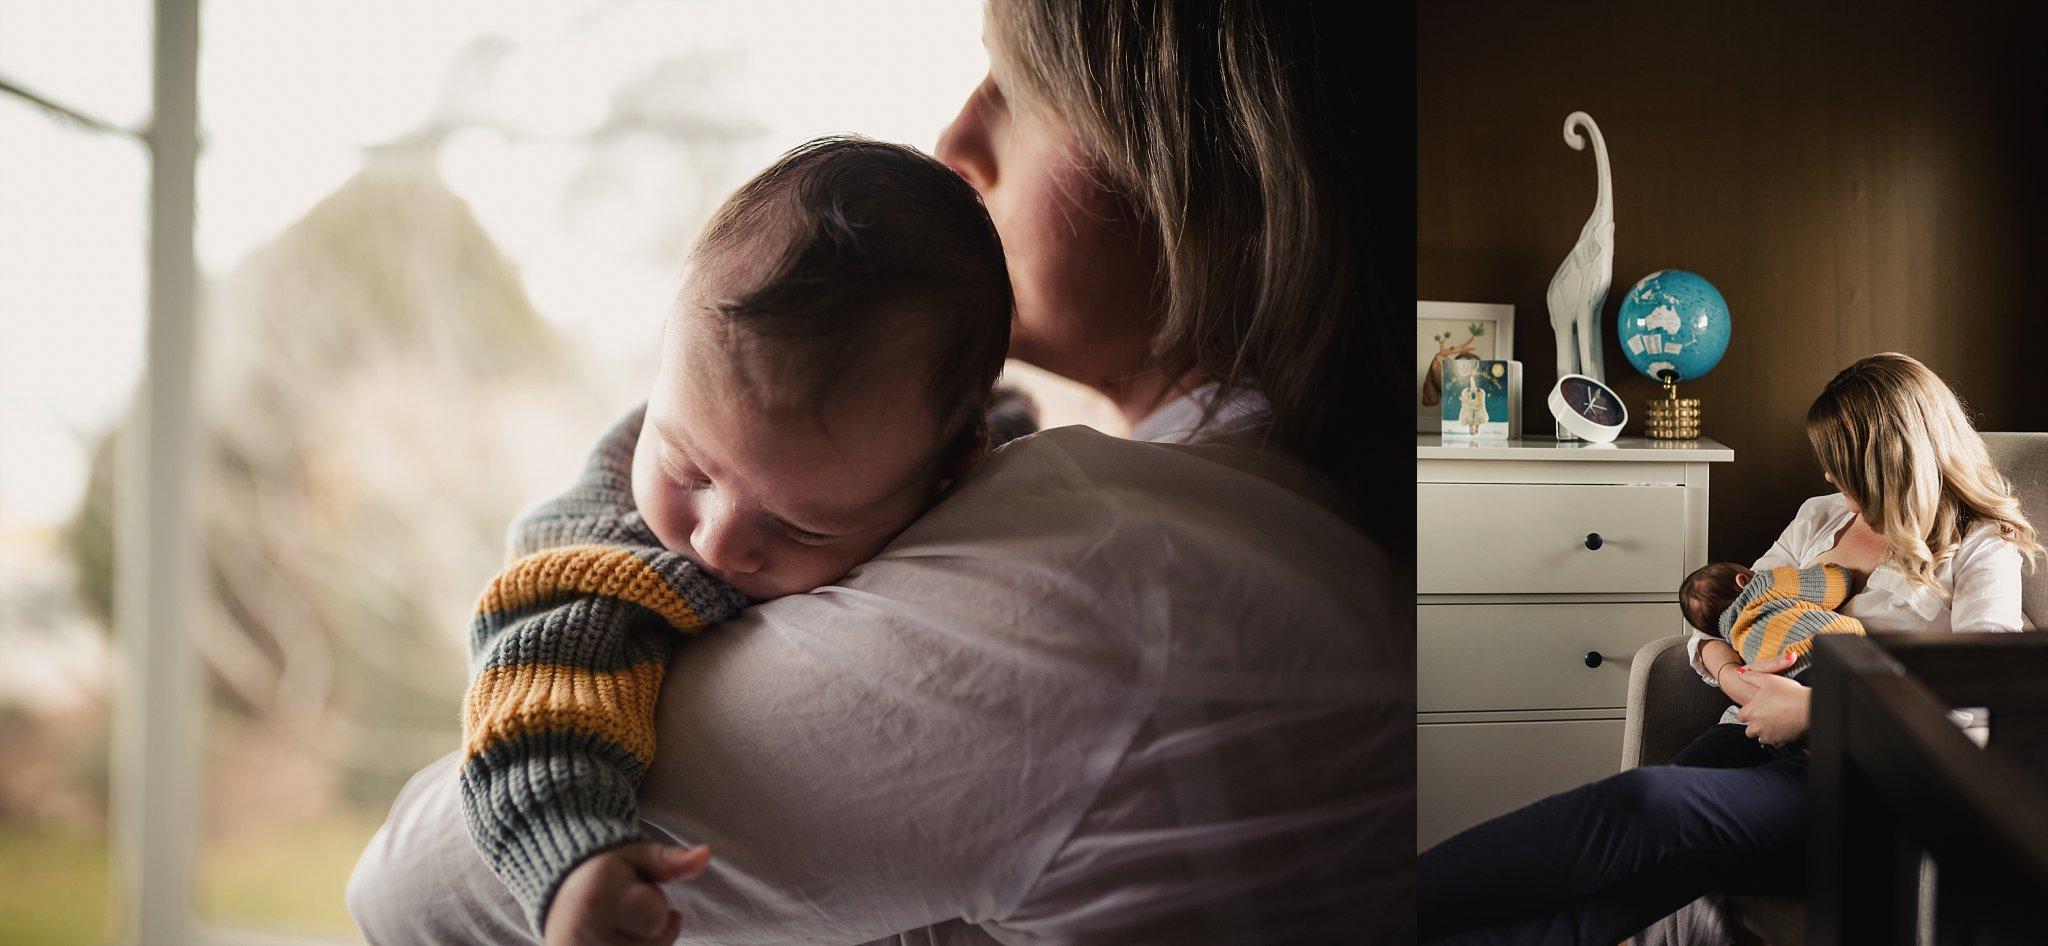 newborn-baby-in-home-family-photography-albury-wodonga-north-east-victoria (2).jpg